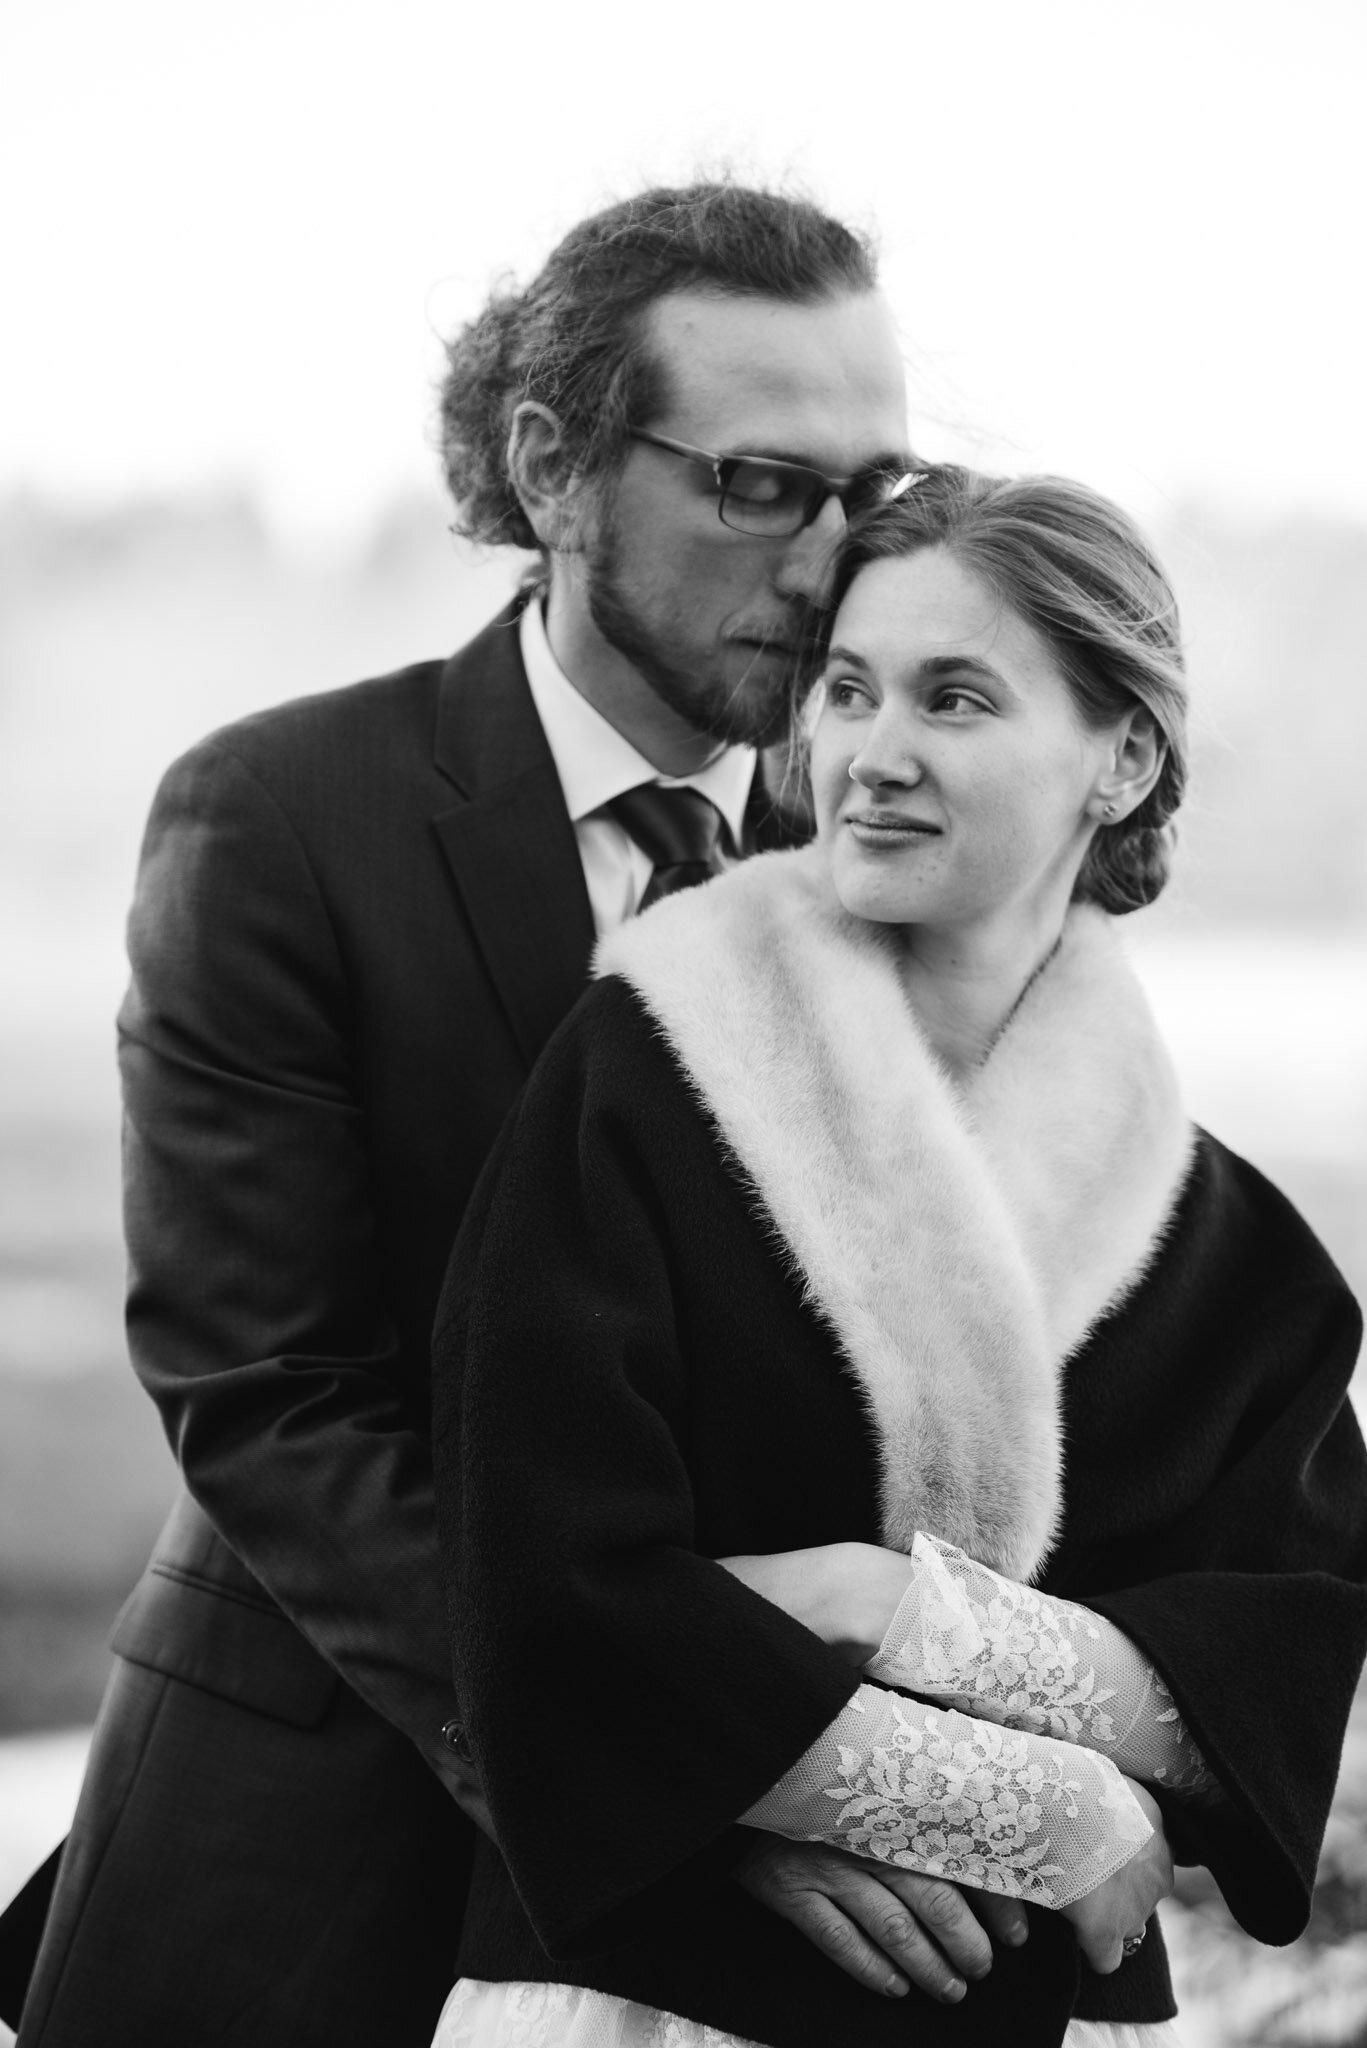 Wedding Couples portrait, Ligonier Wedding Photographer, Ligonier PA wedding, wedding potraits-1365.jpg